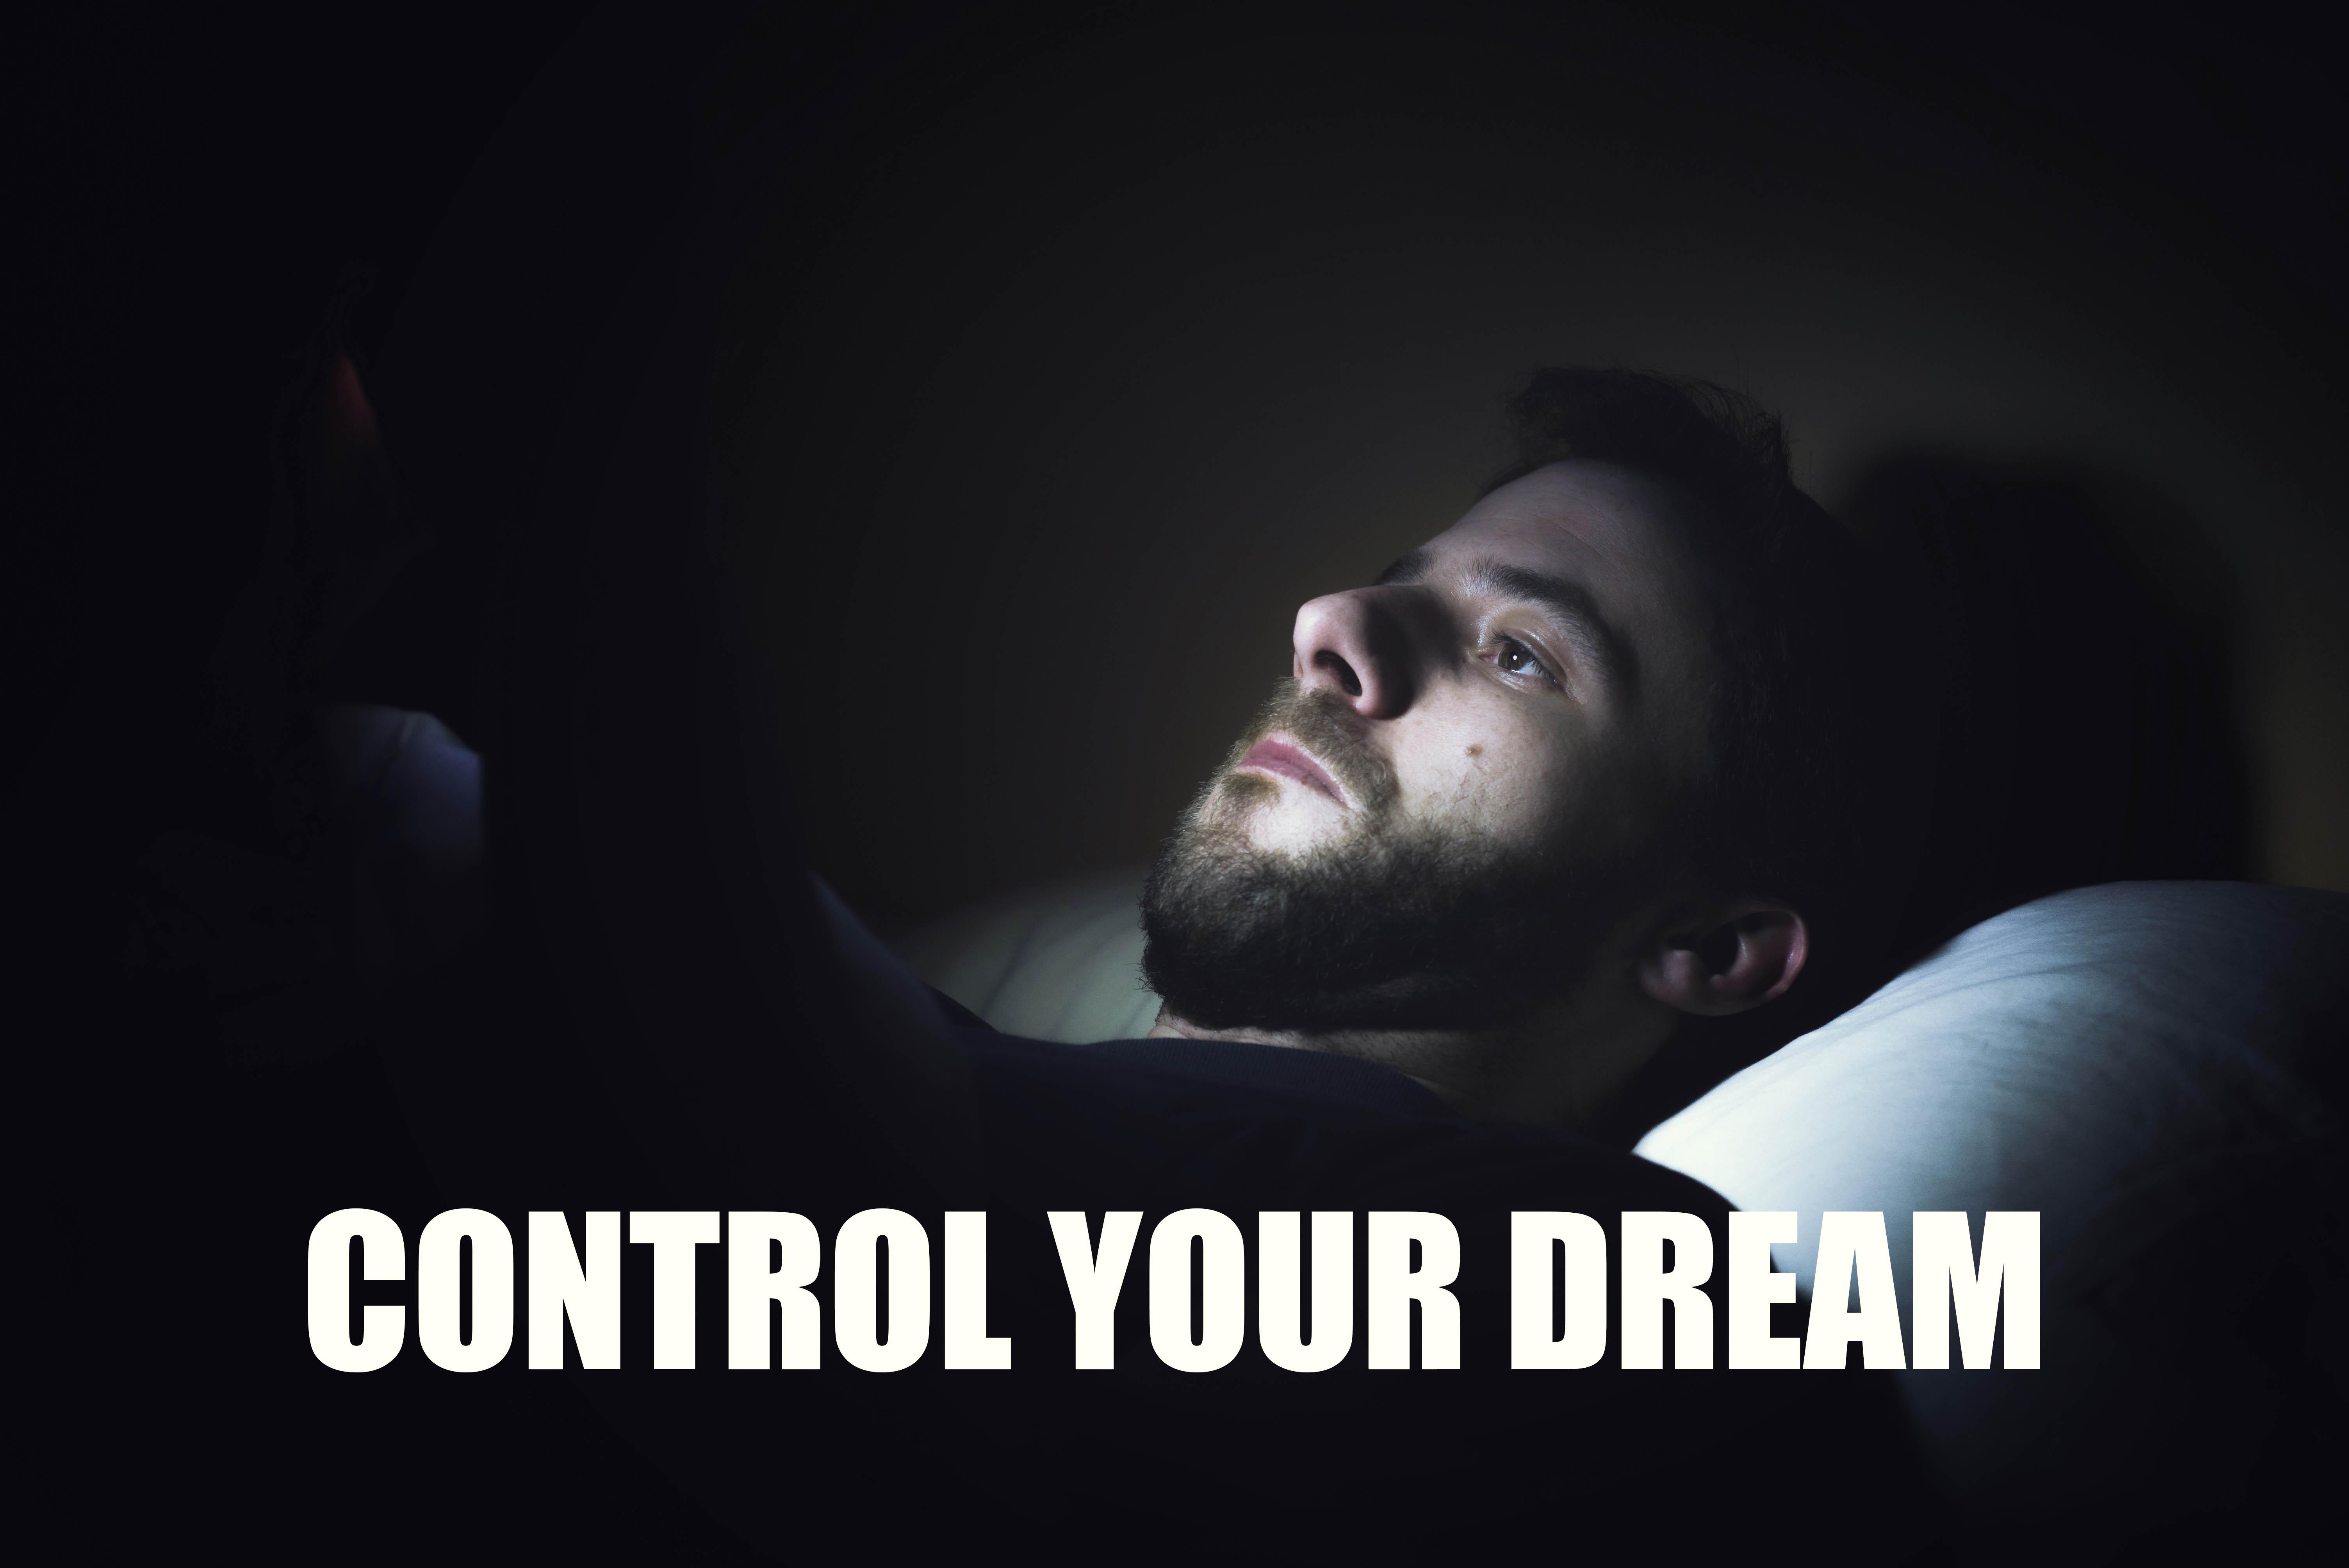 CONTROLAR TU SUEÑO/夢をコントロール